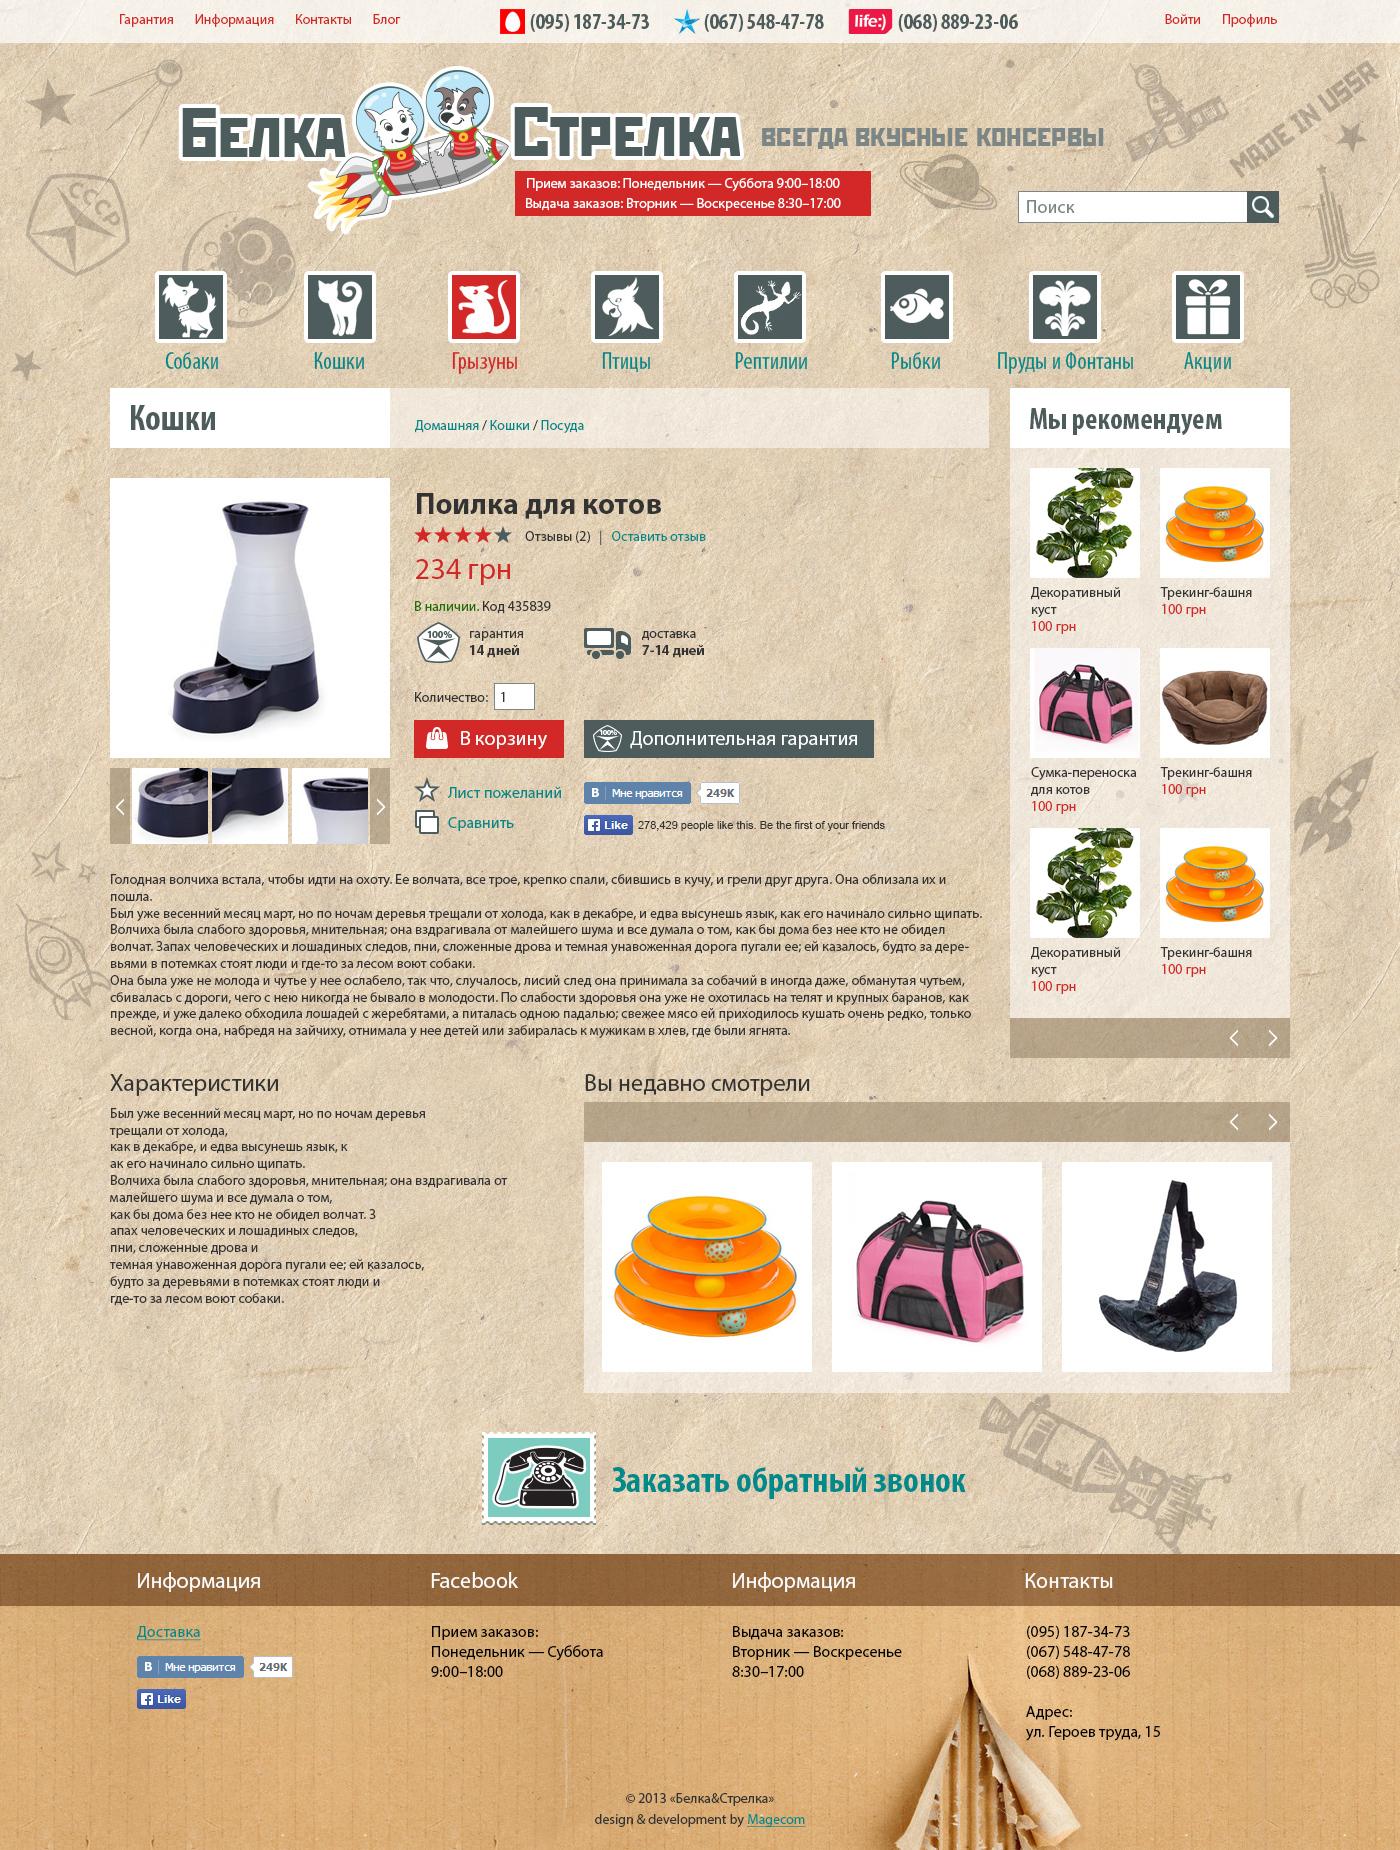 belka&strelka--01-product